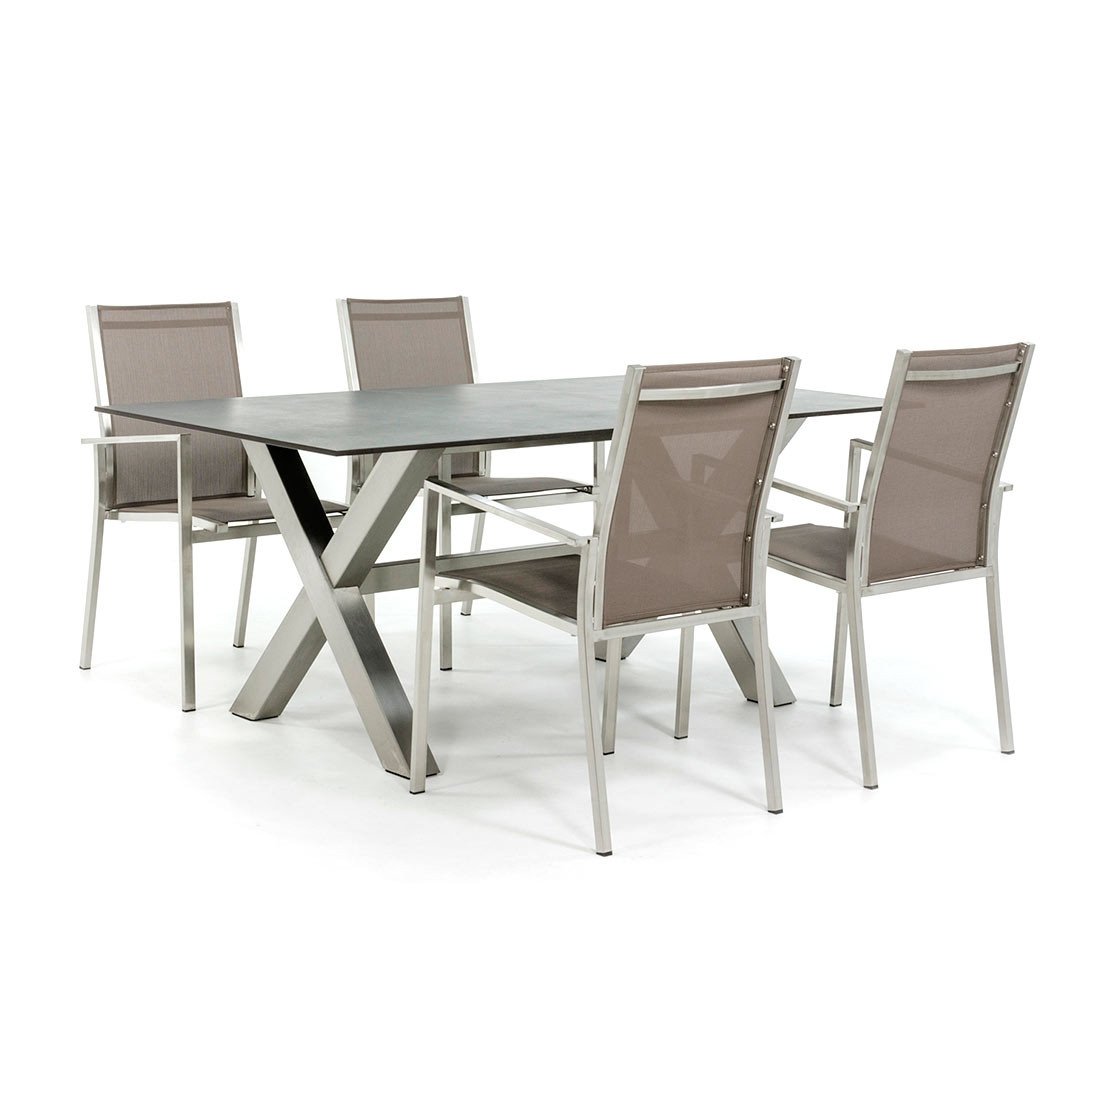 Dekton tafel met RVS tafelonderstel en stoelen